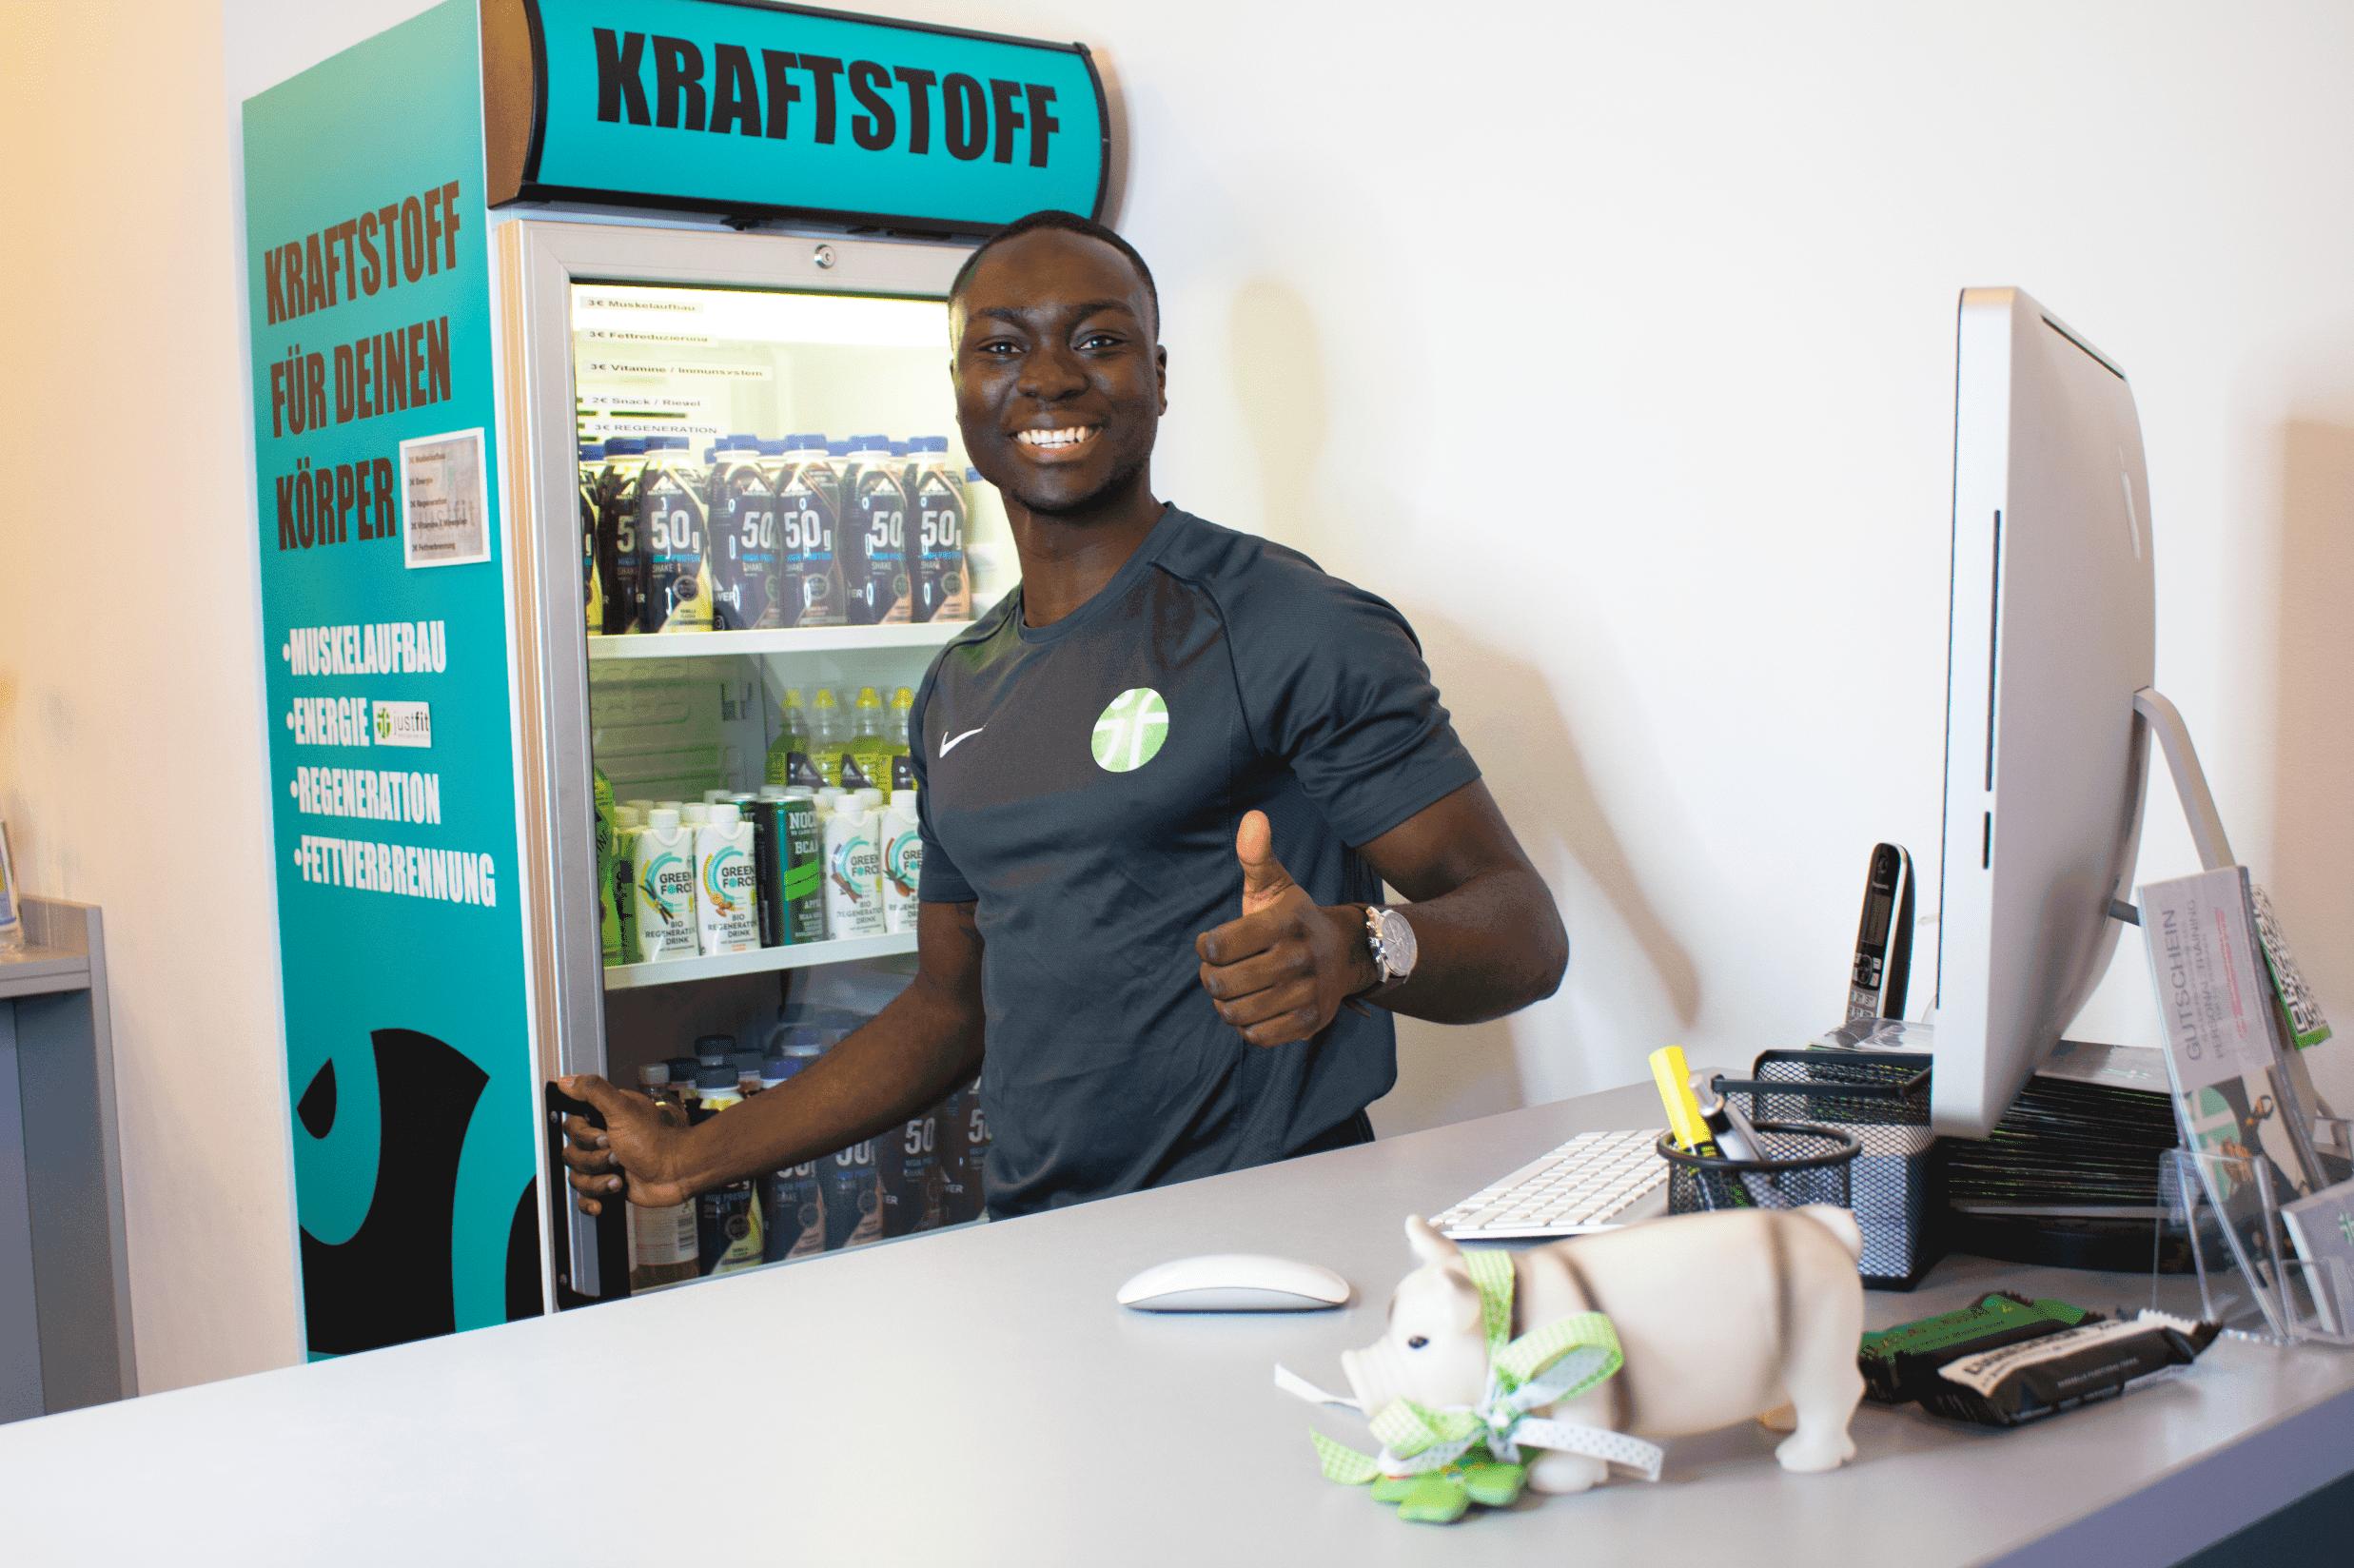 Justfit club Hamburg ems Training fitness studio mit strom hamburg schnell abnehmen